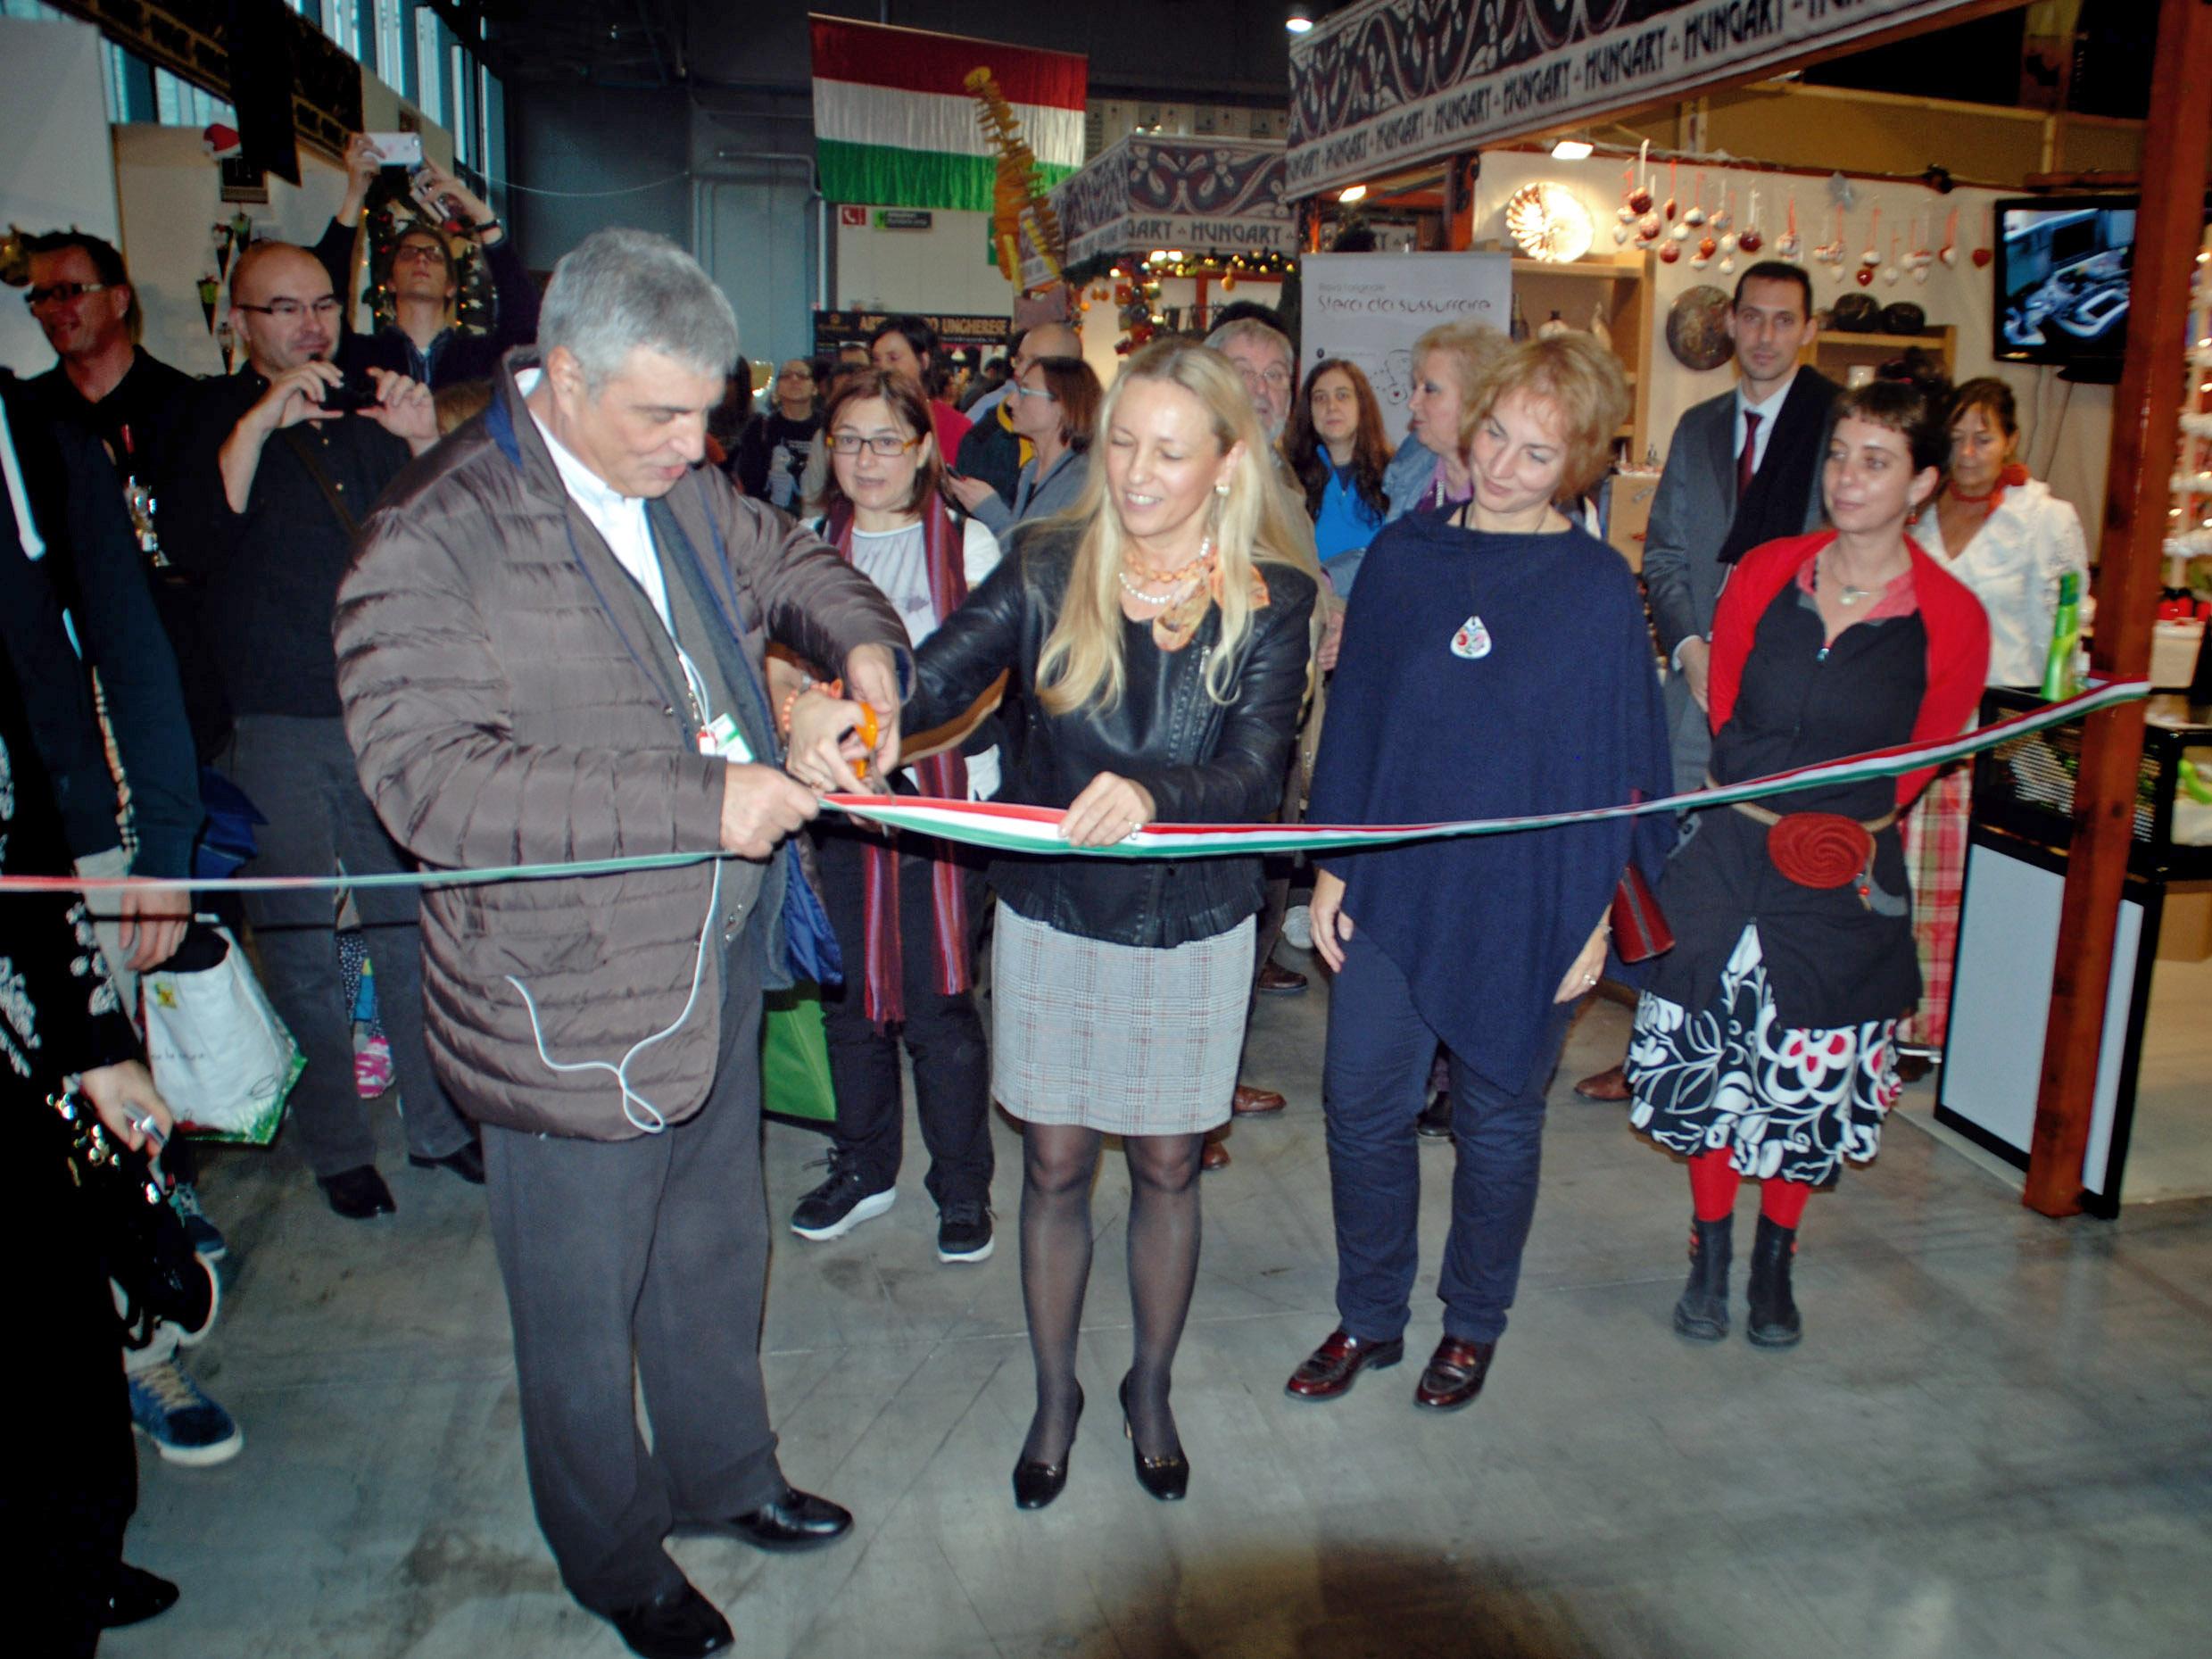 Opening - L'Artigiano in Fiera: Exhibition and Fair in Milan